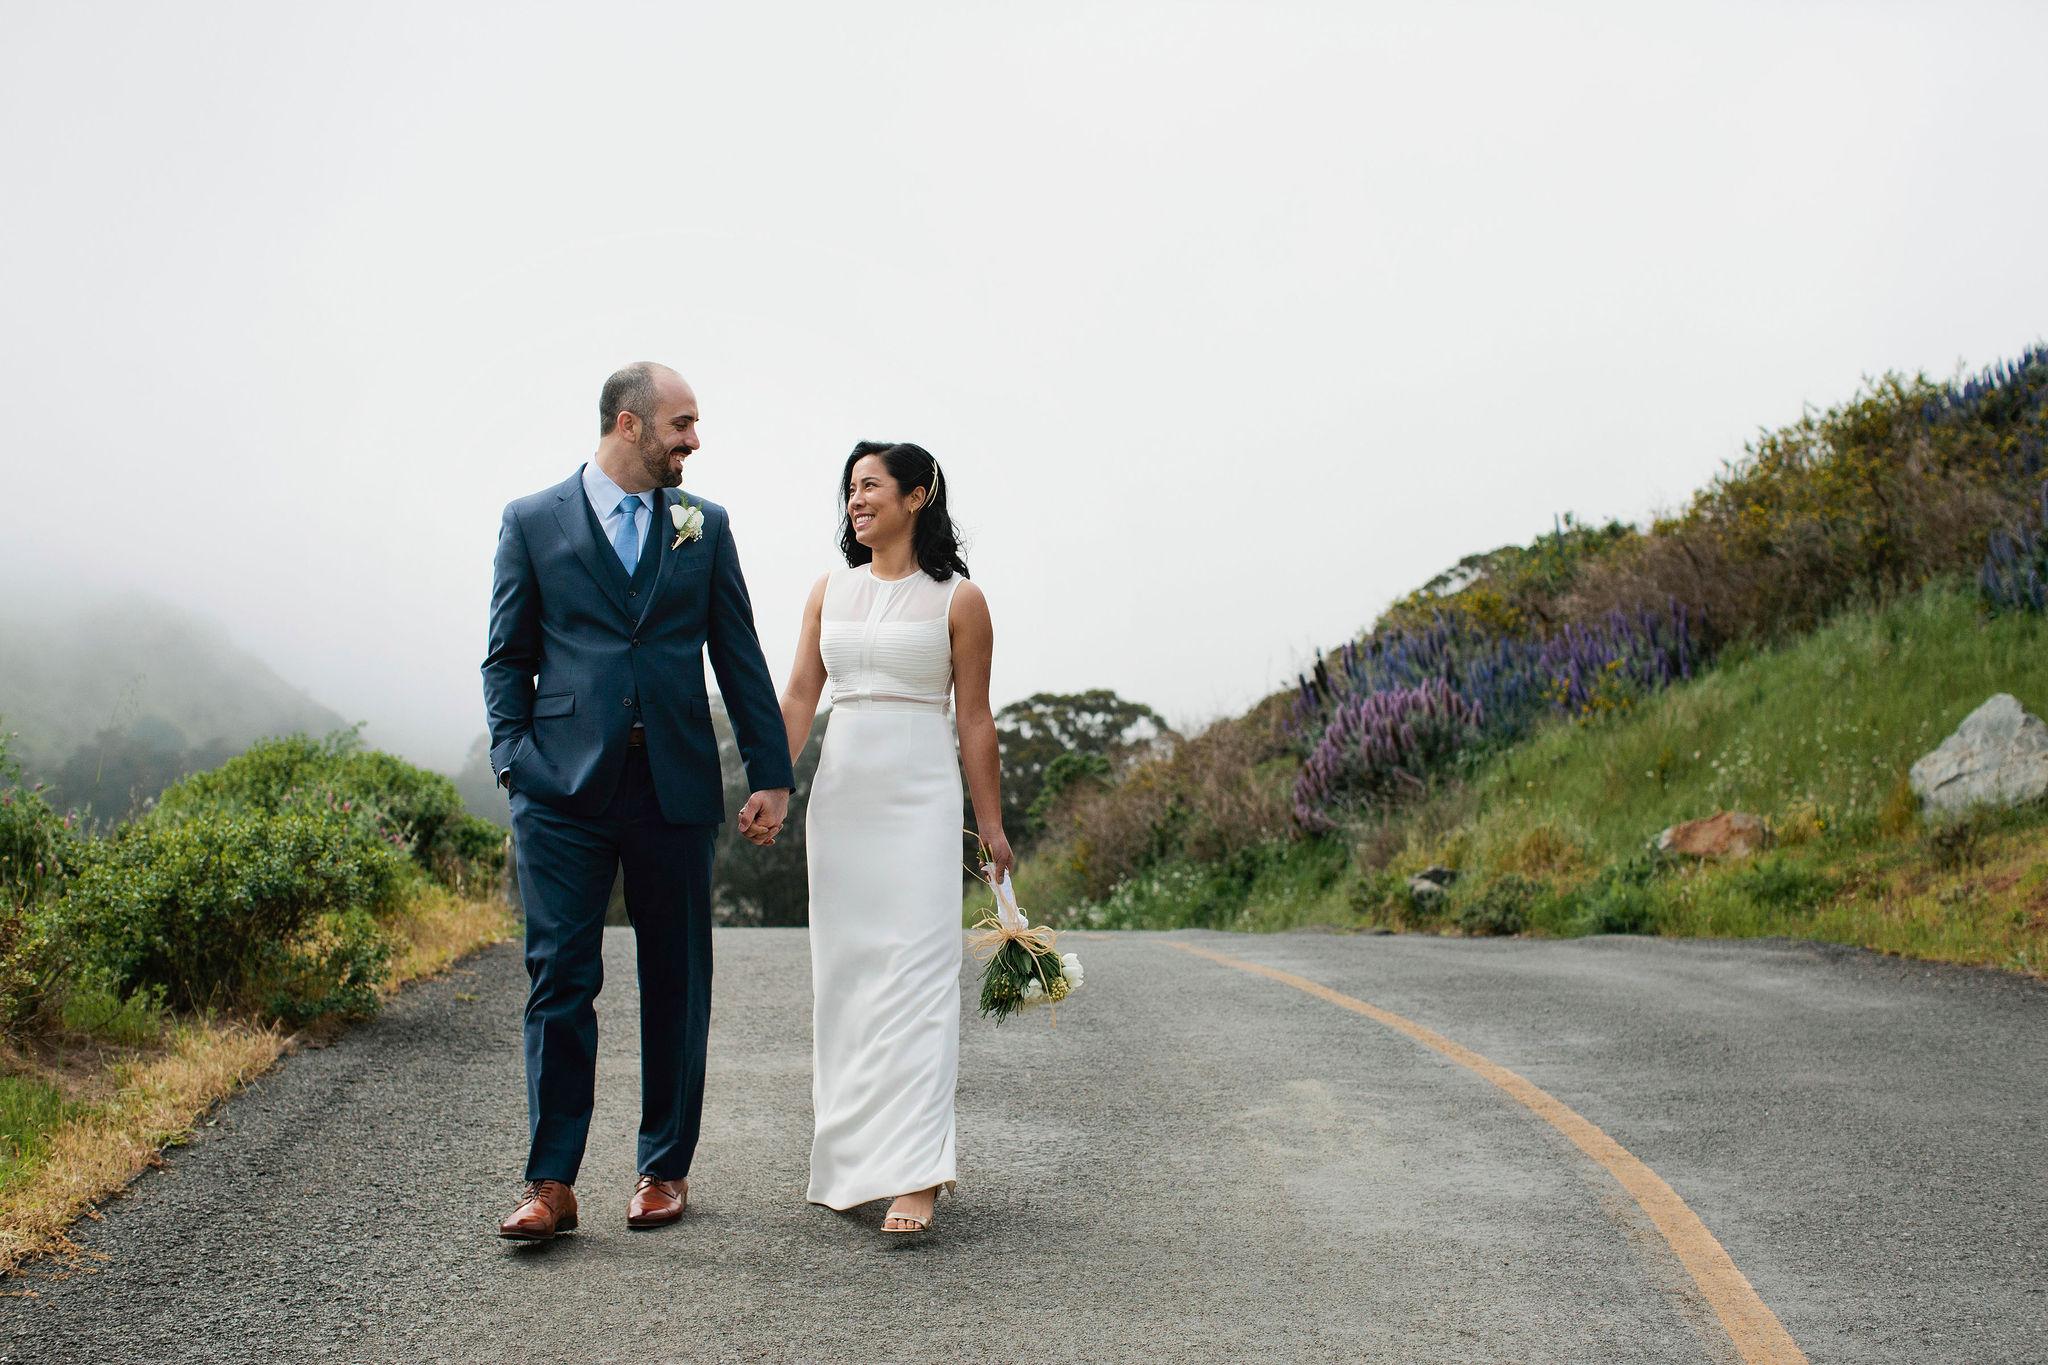 Presidio-Yacht-Club-Wedding-026.JPG